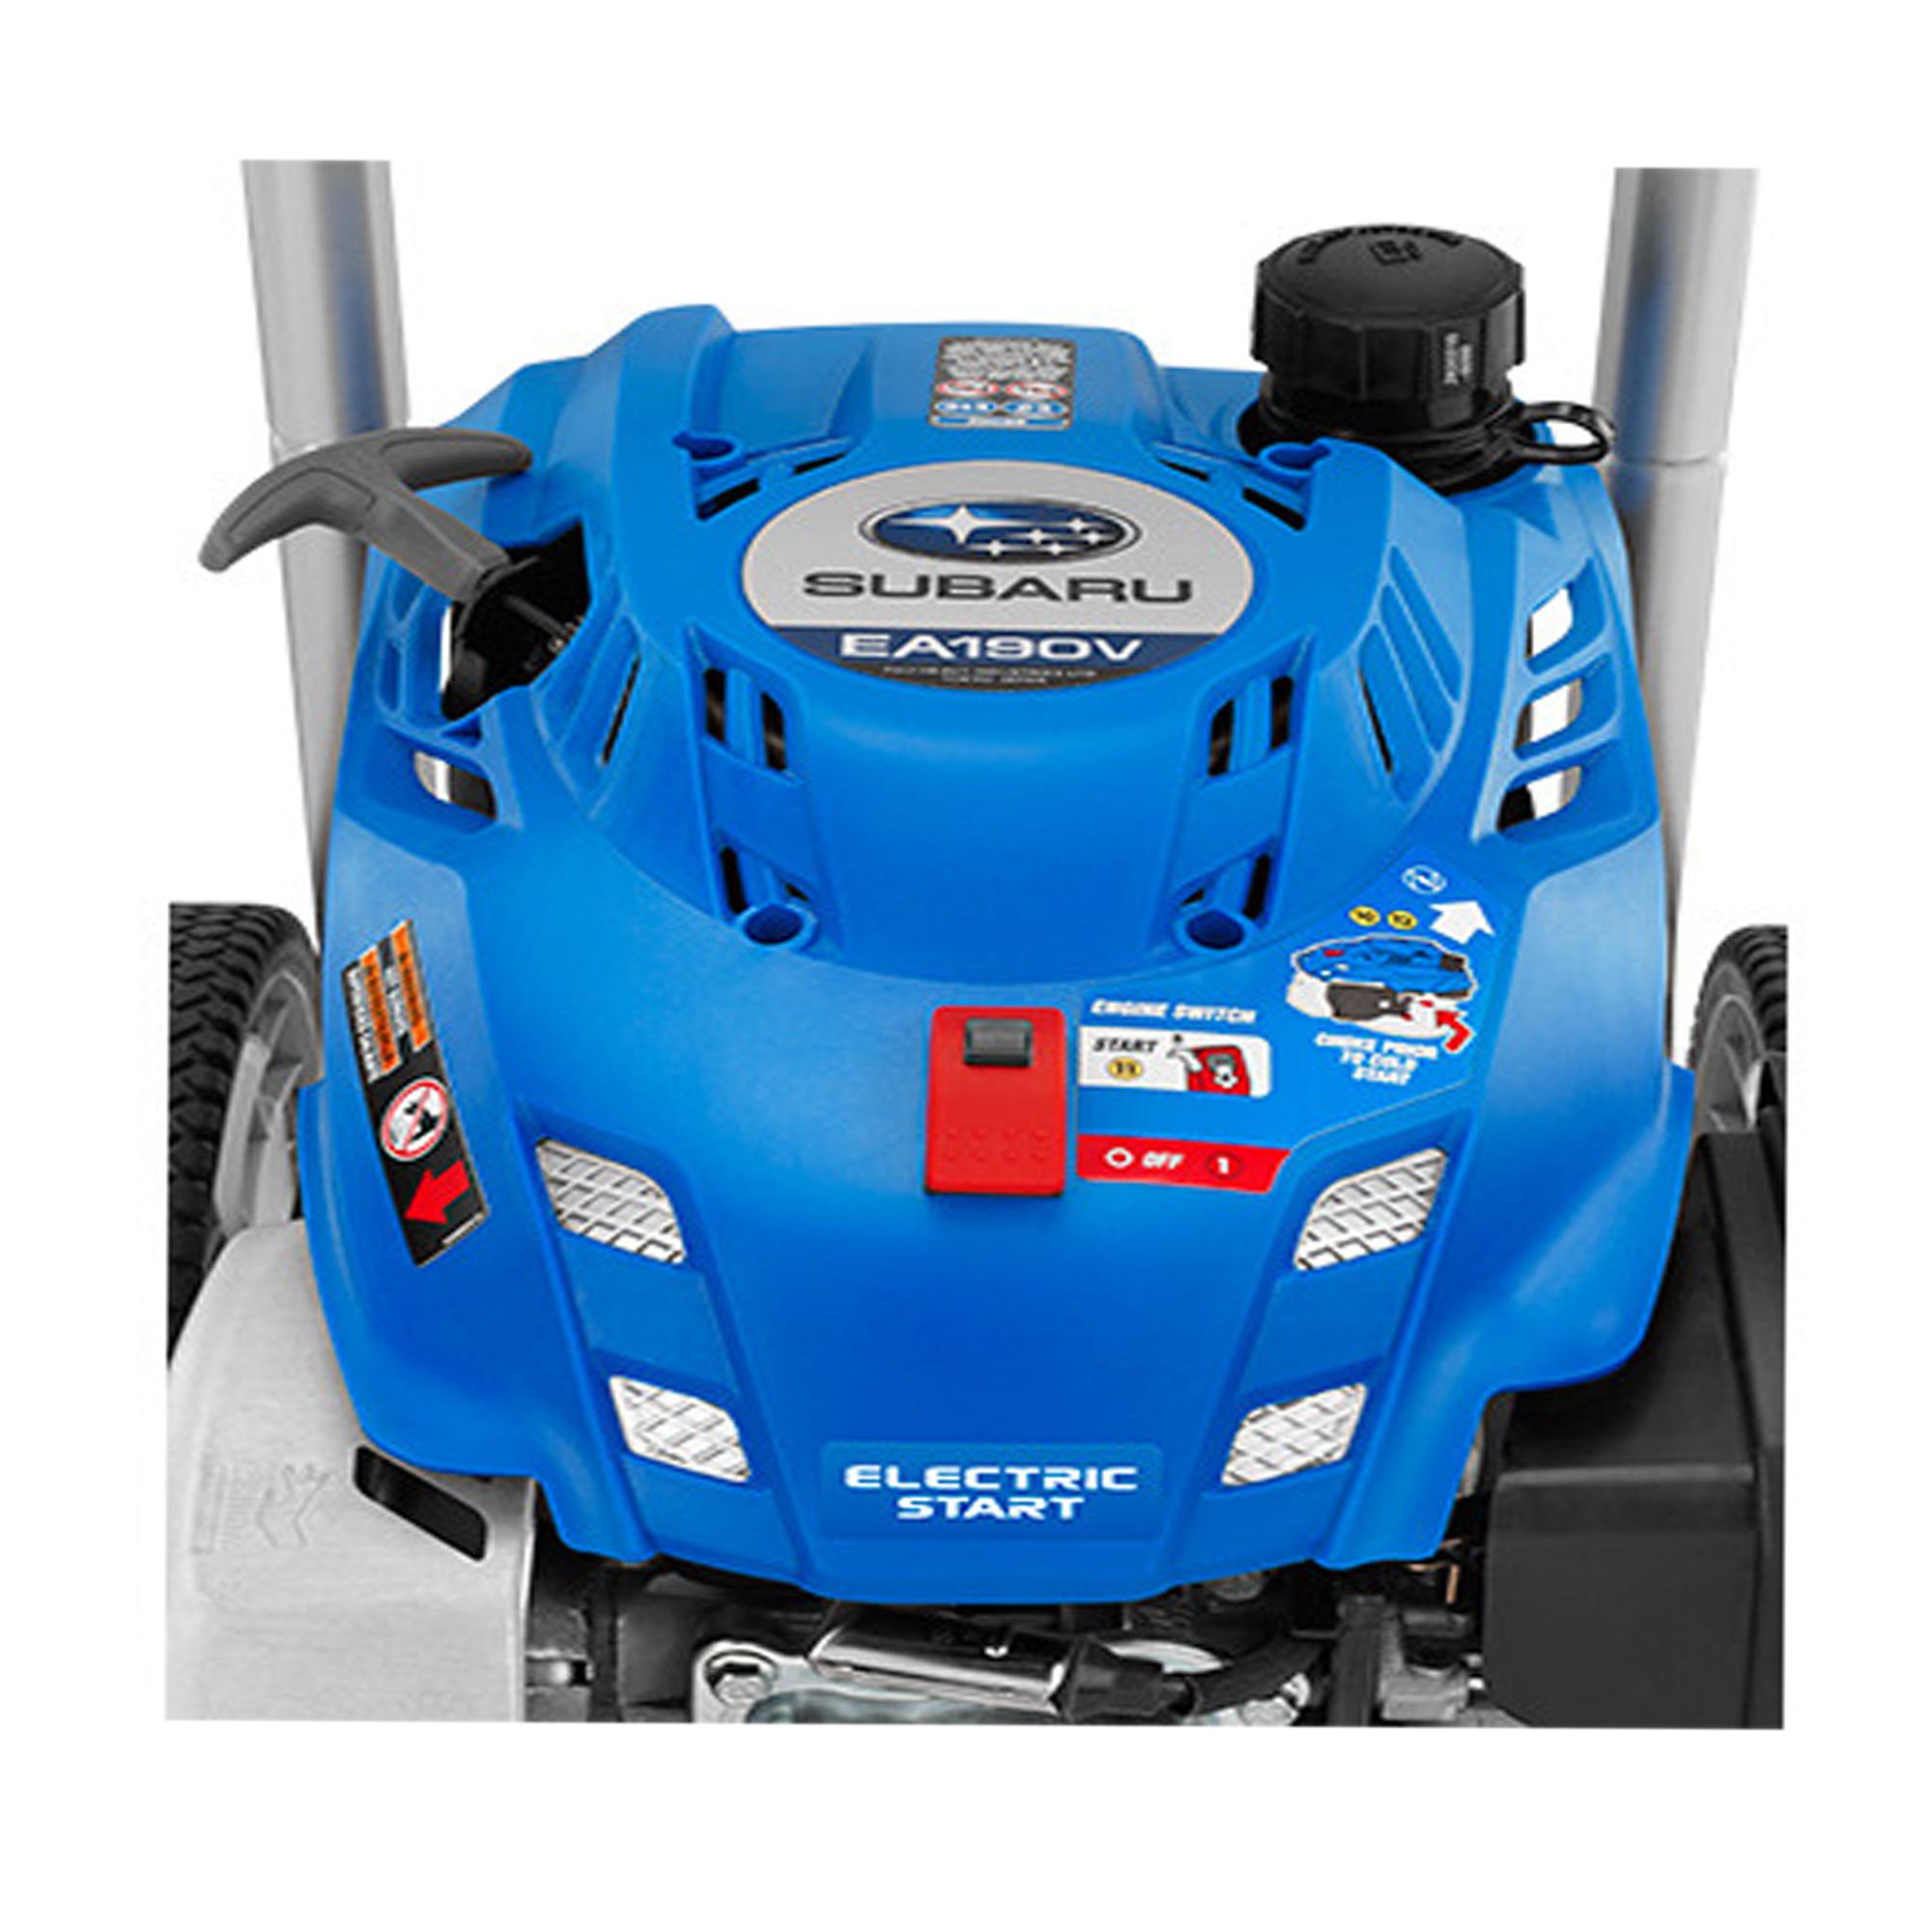 Powerstroke 3100 Psi 2 4 Gpm Gas Power Pressure Washer